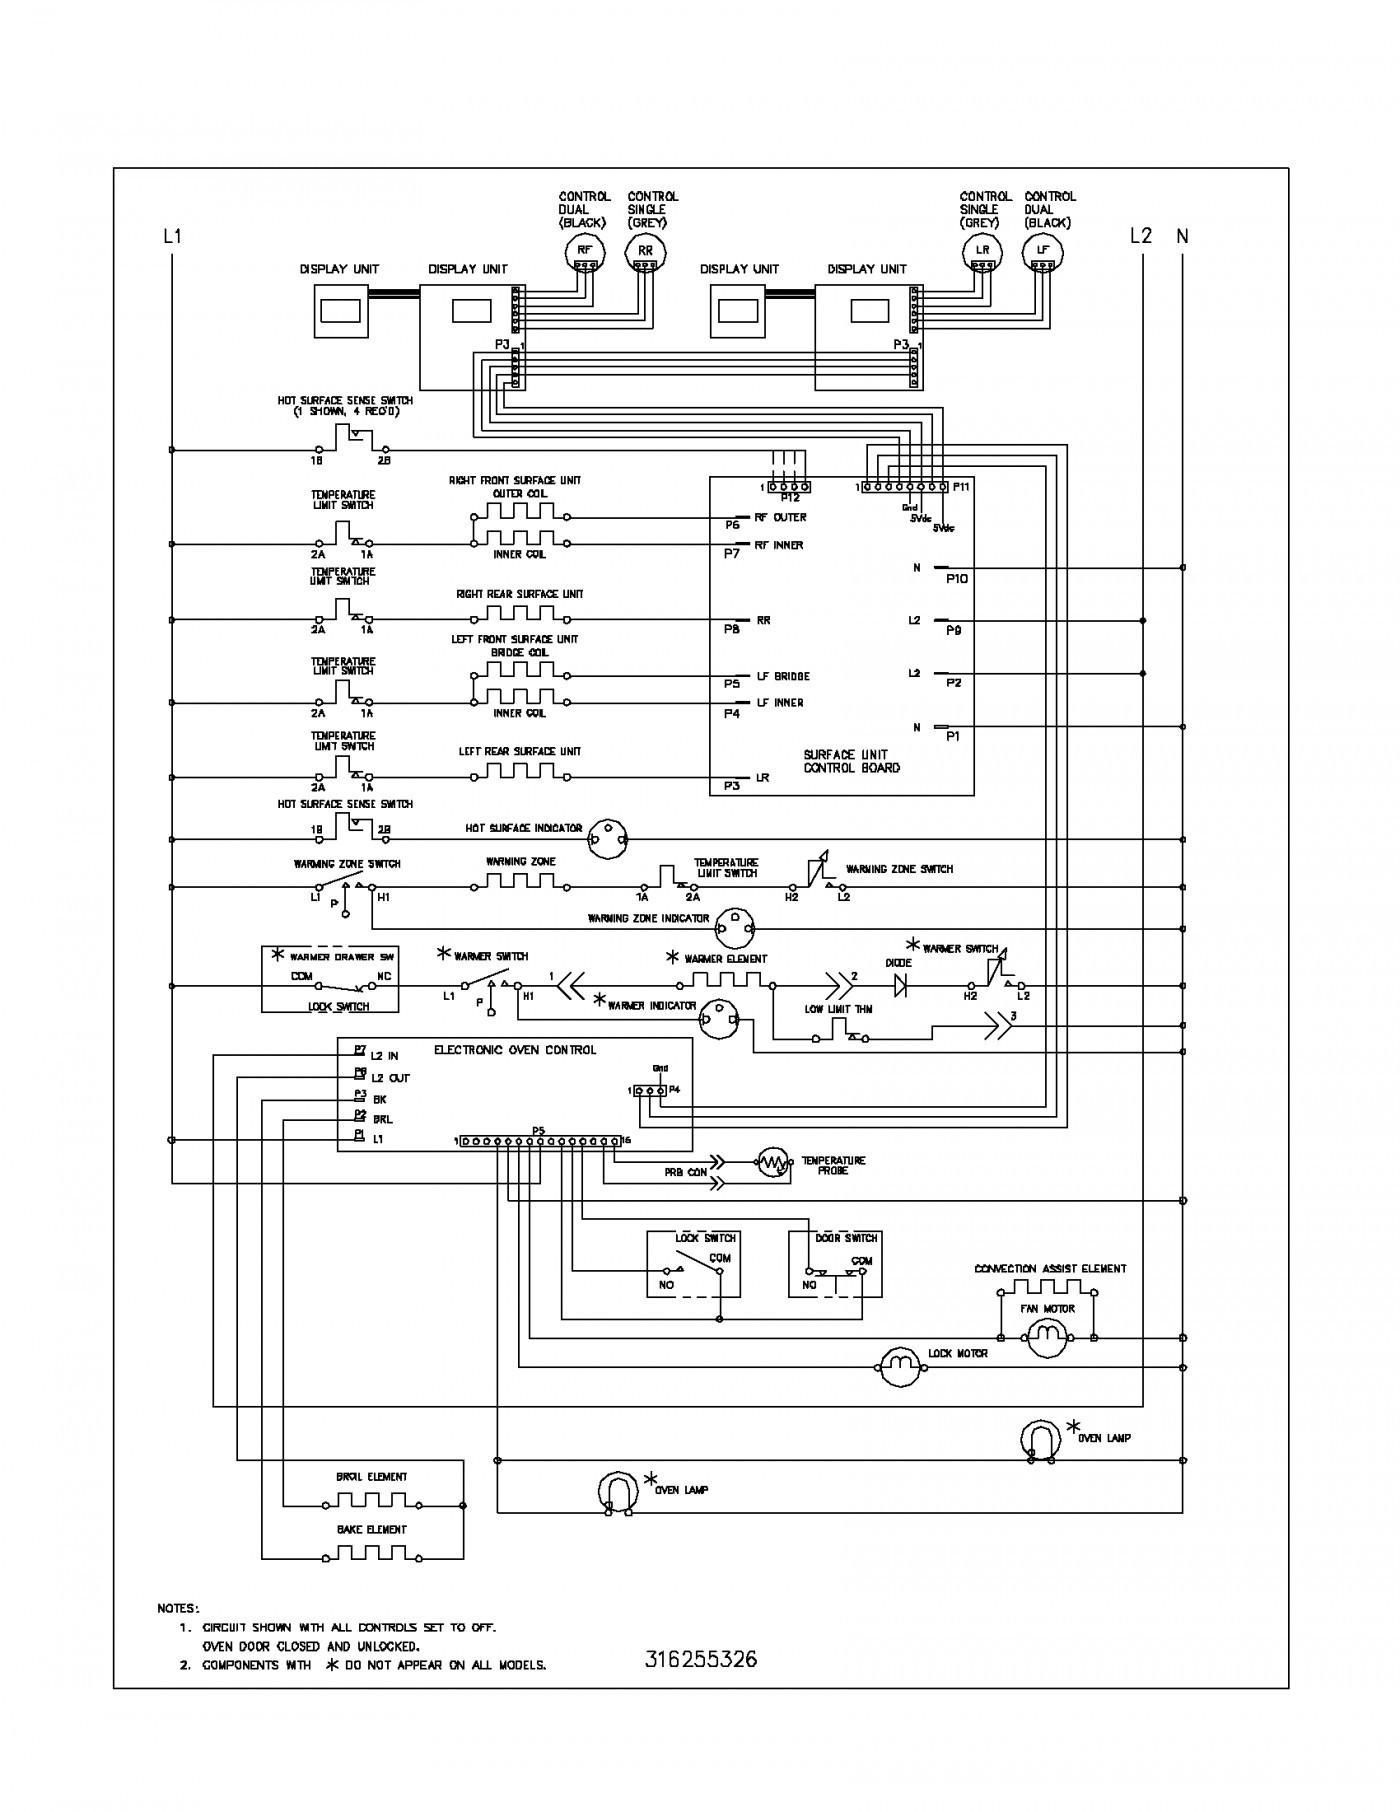 Nordyne Wiring Diagram Electric Furnace Best Wonderful Miller Oil